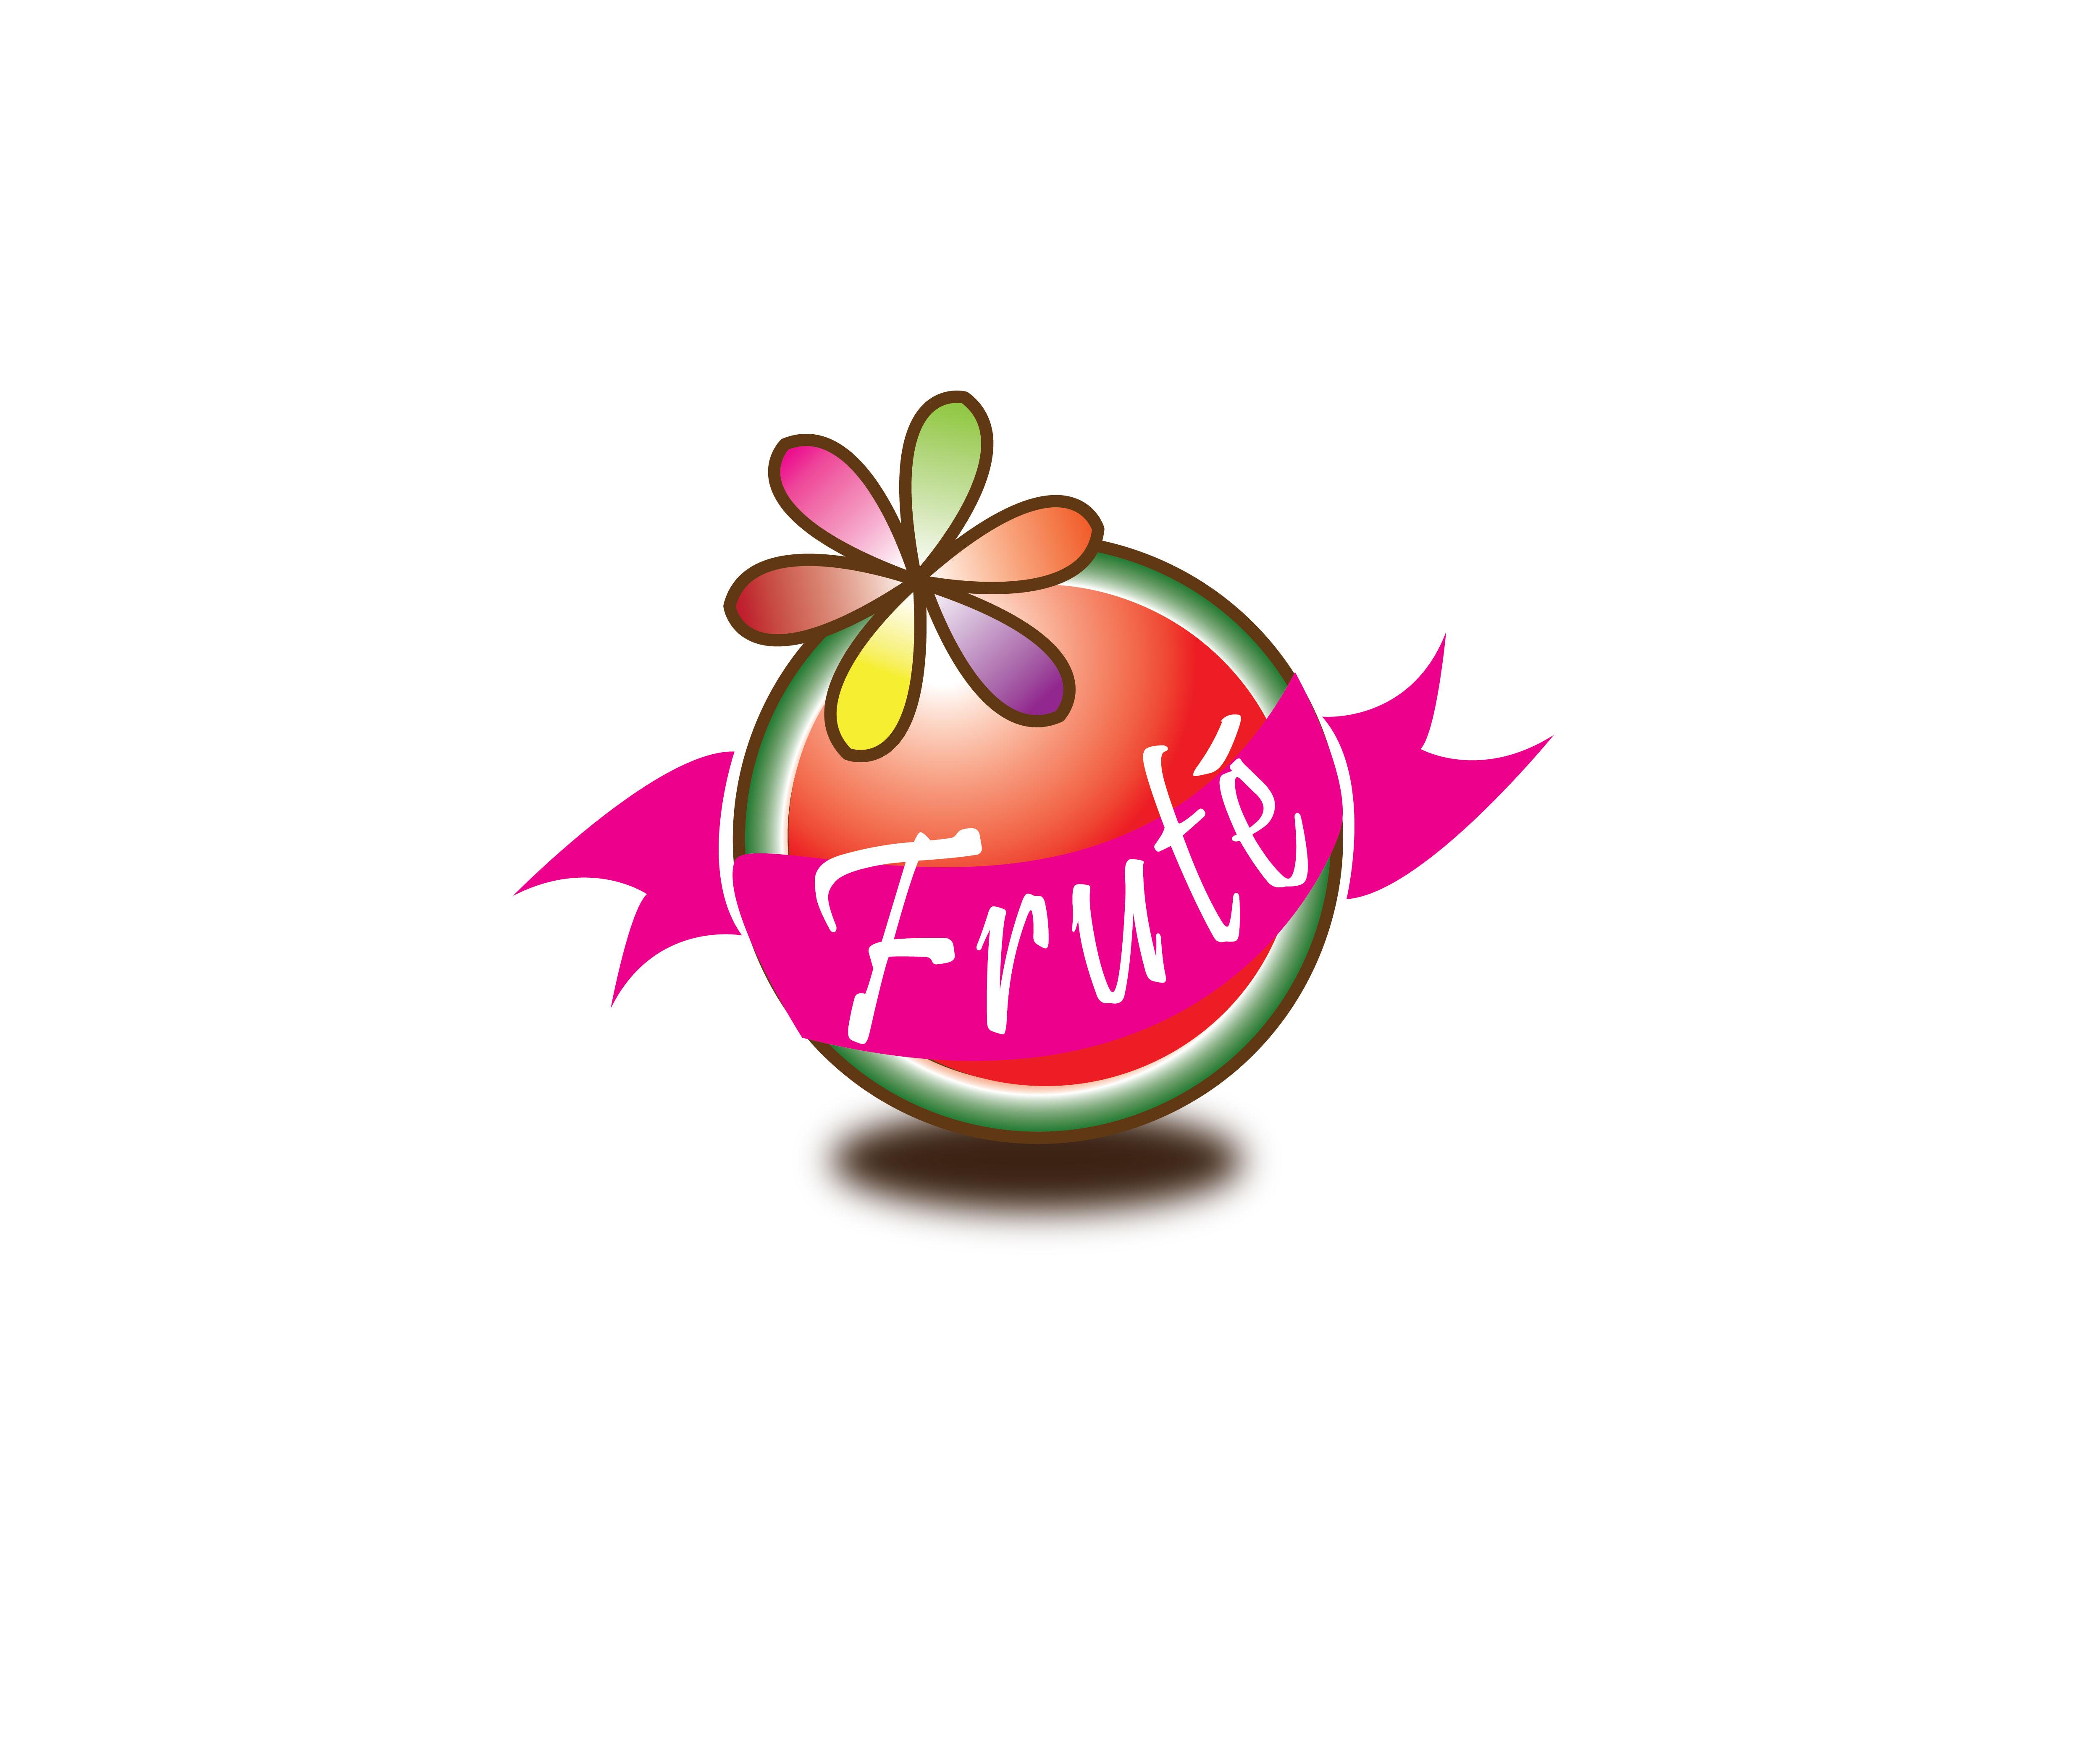 Logo Design by jhunzkie24 - Entry No. 76 in the Logo Design Contest Imaginative Logo Design for Fruté.